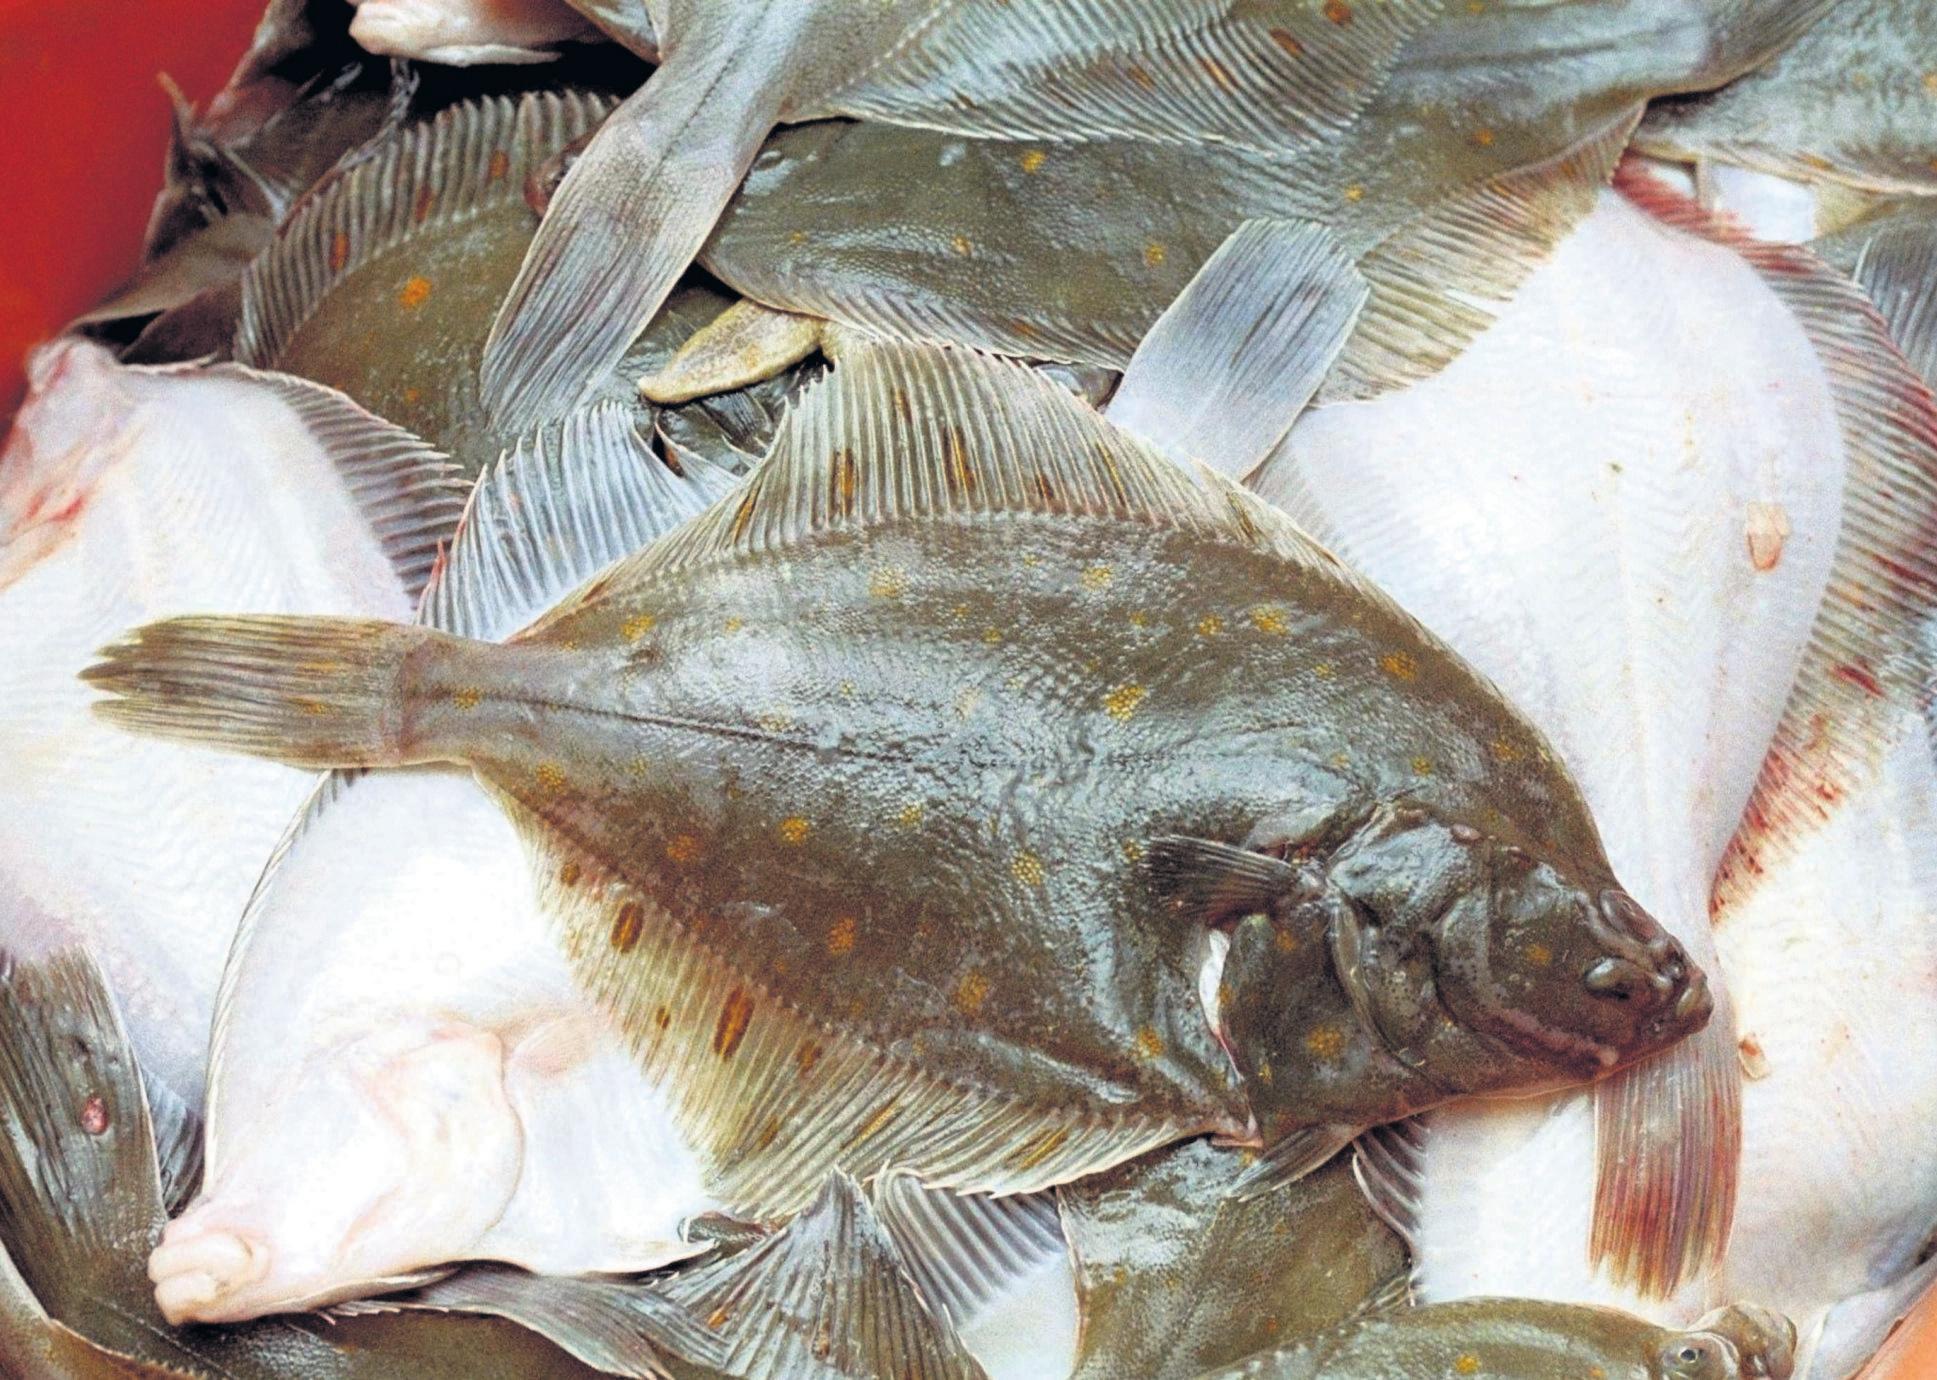 Parlevliet & Van der Plas verstevigt platvis-poot, overname Volendamse visverwerker